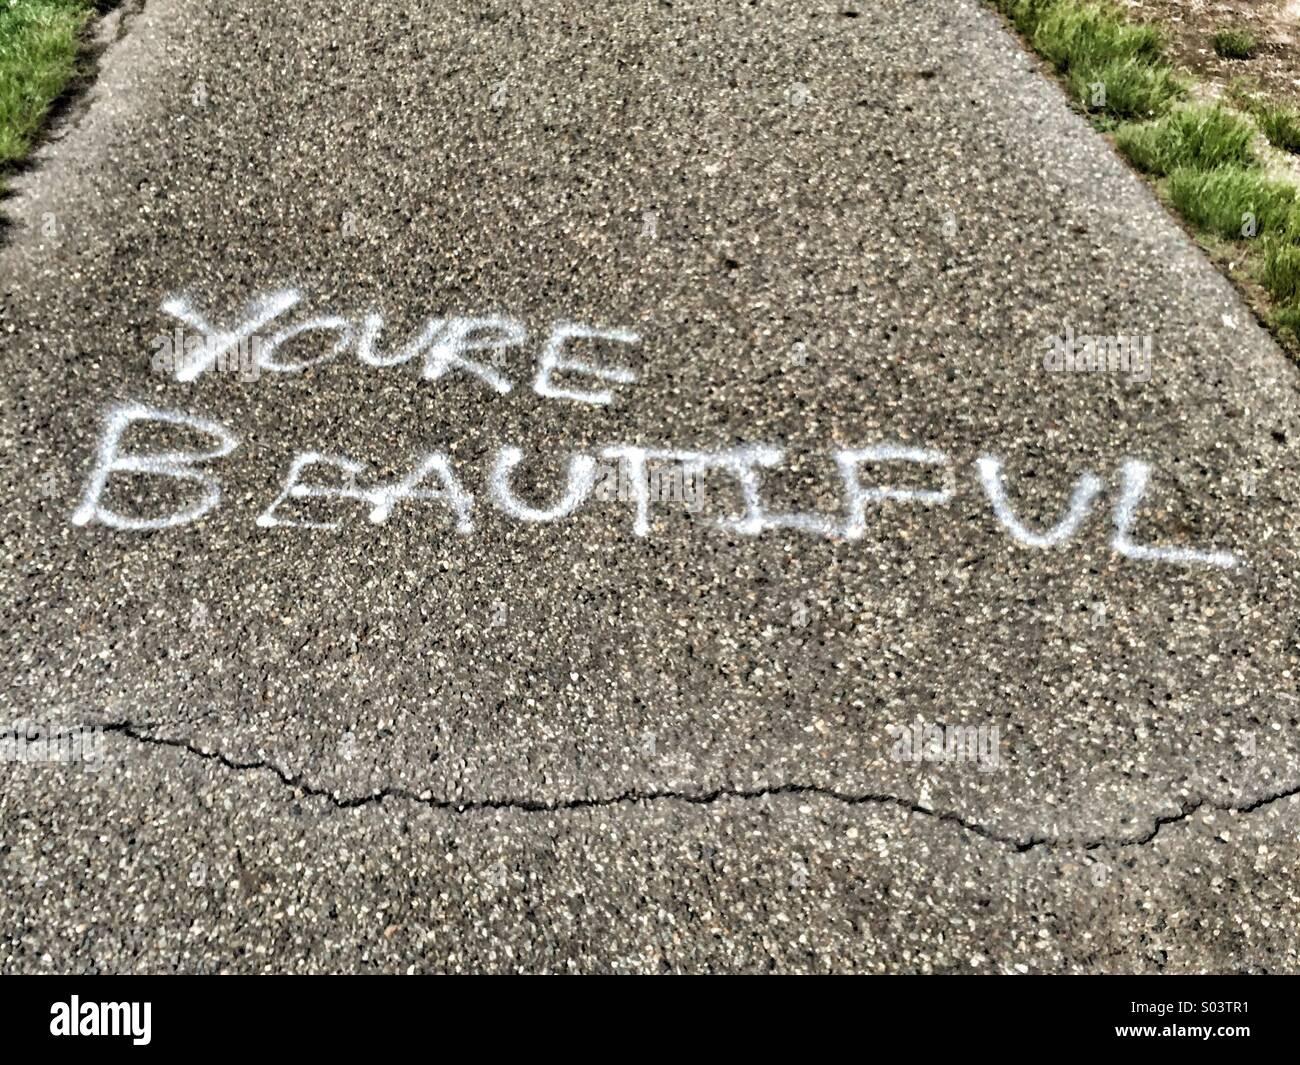 You're Beautiful written on walkway - Stock Image